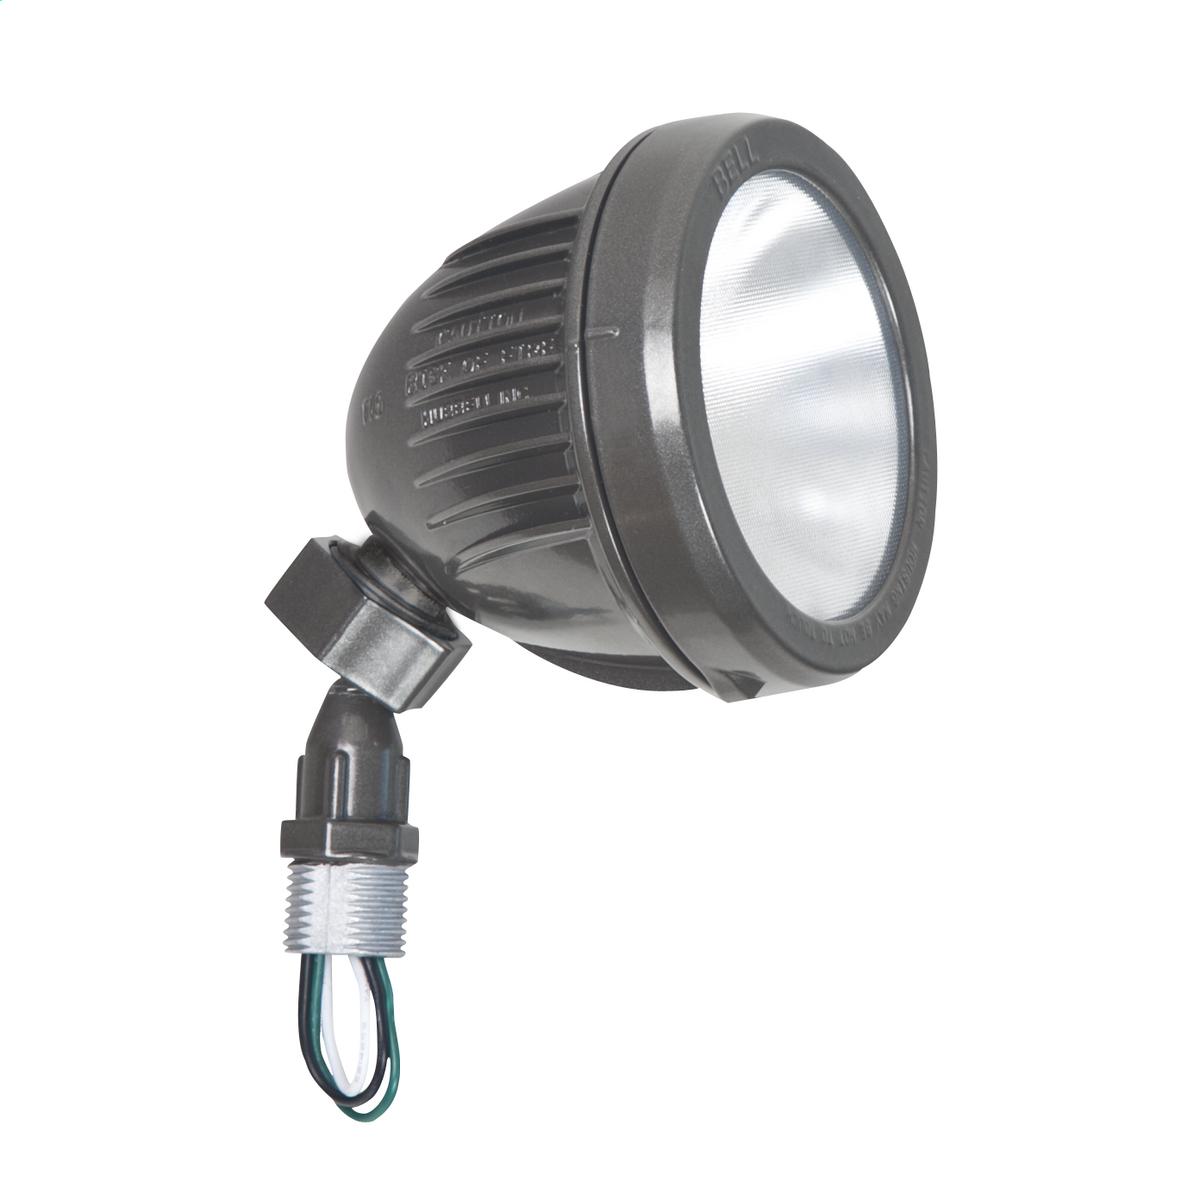 RAC LL1000Z BRONZE LED SWIVEL JOINT FLOODLIGHT LAMPHOLDER CS=4